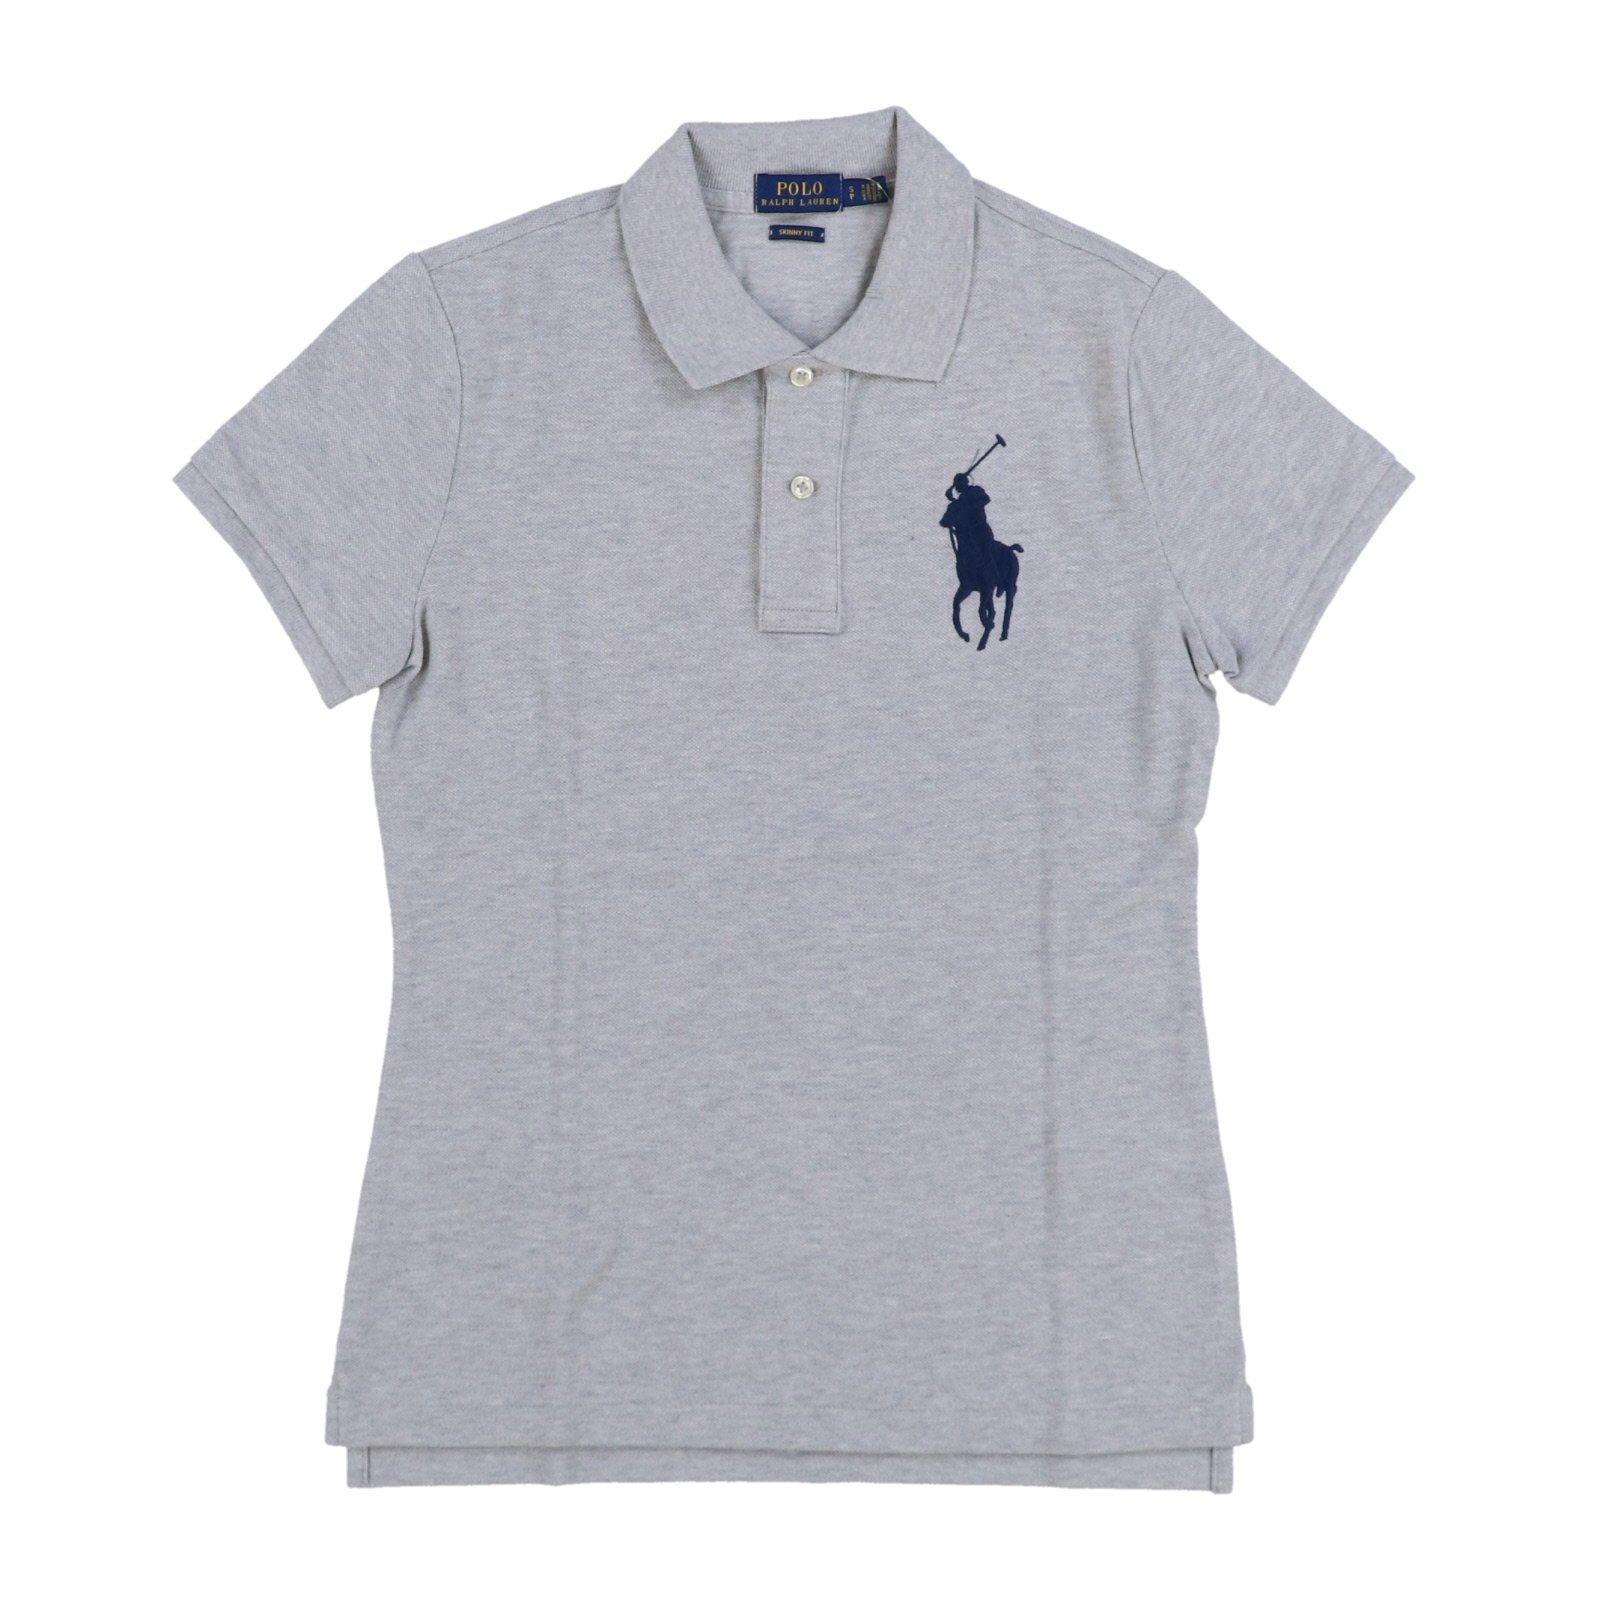 Polo Ralph Lauren 女士修身大马 Polo 衫